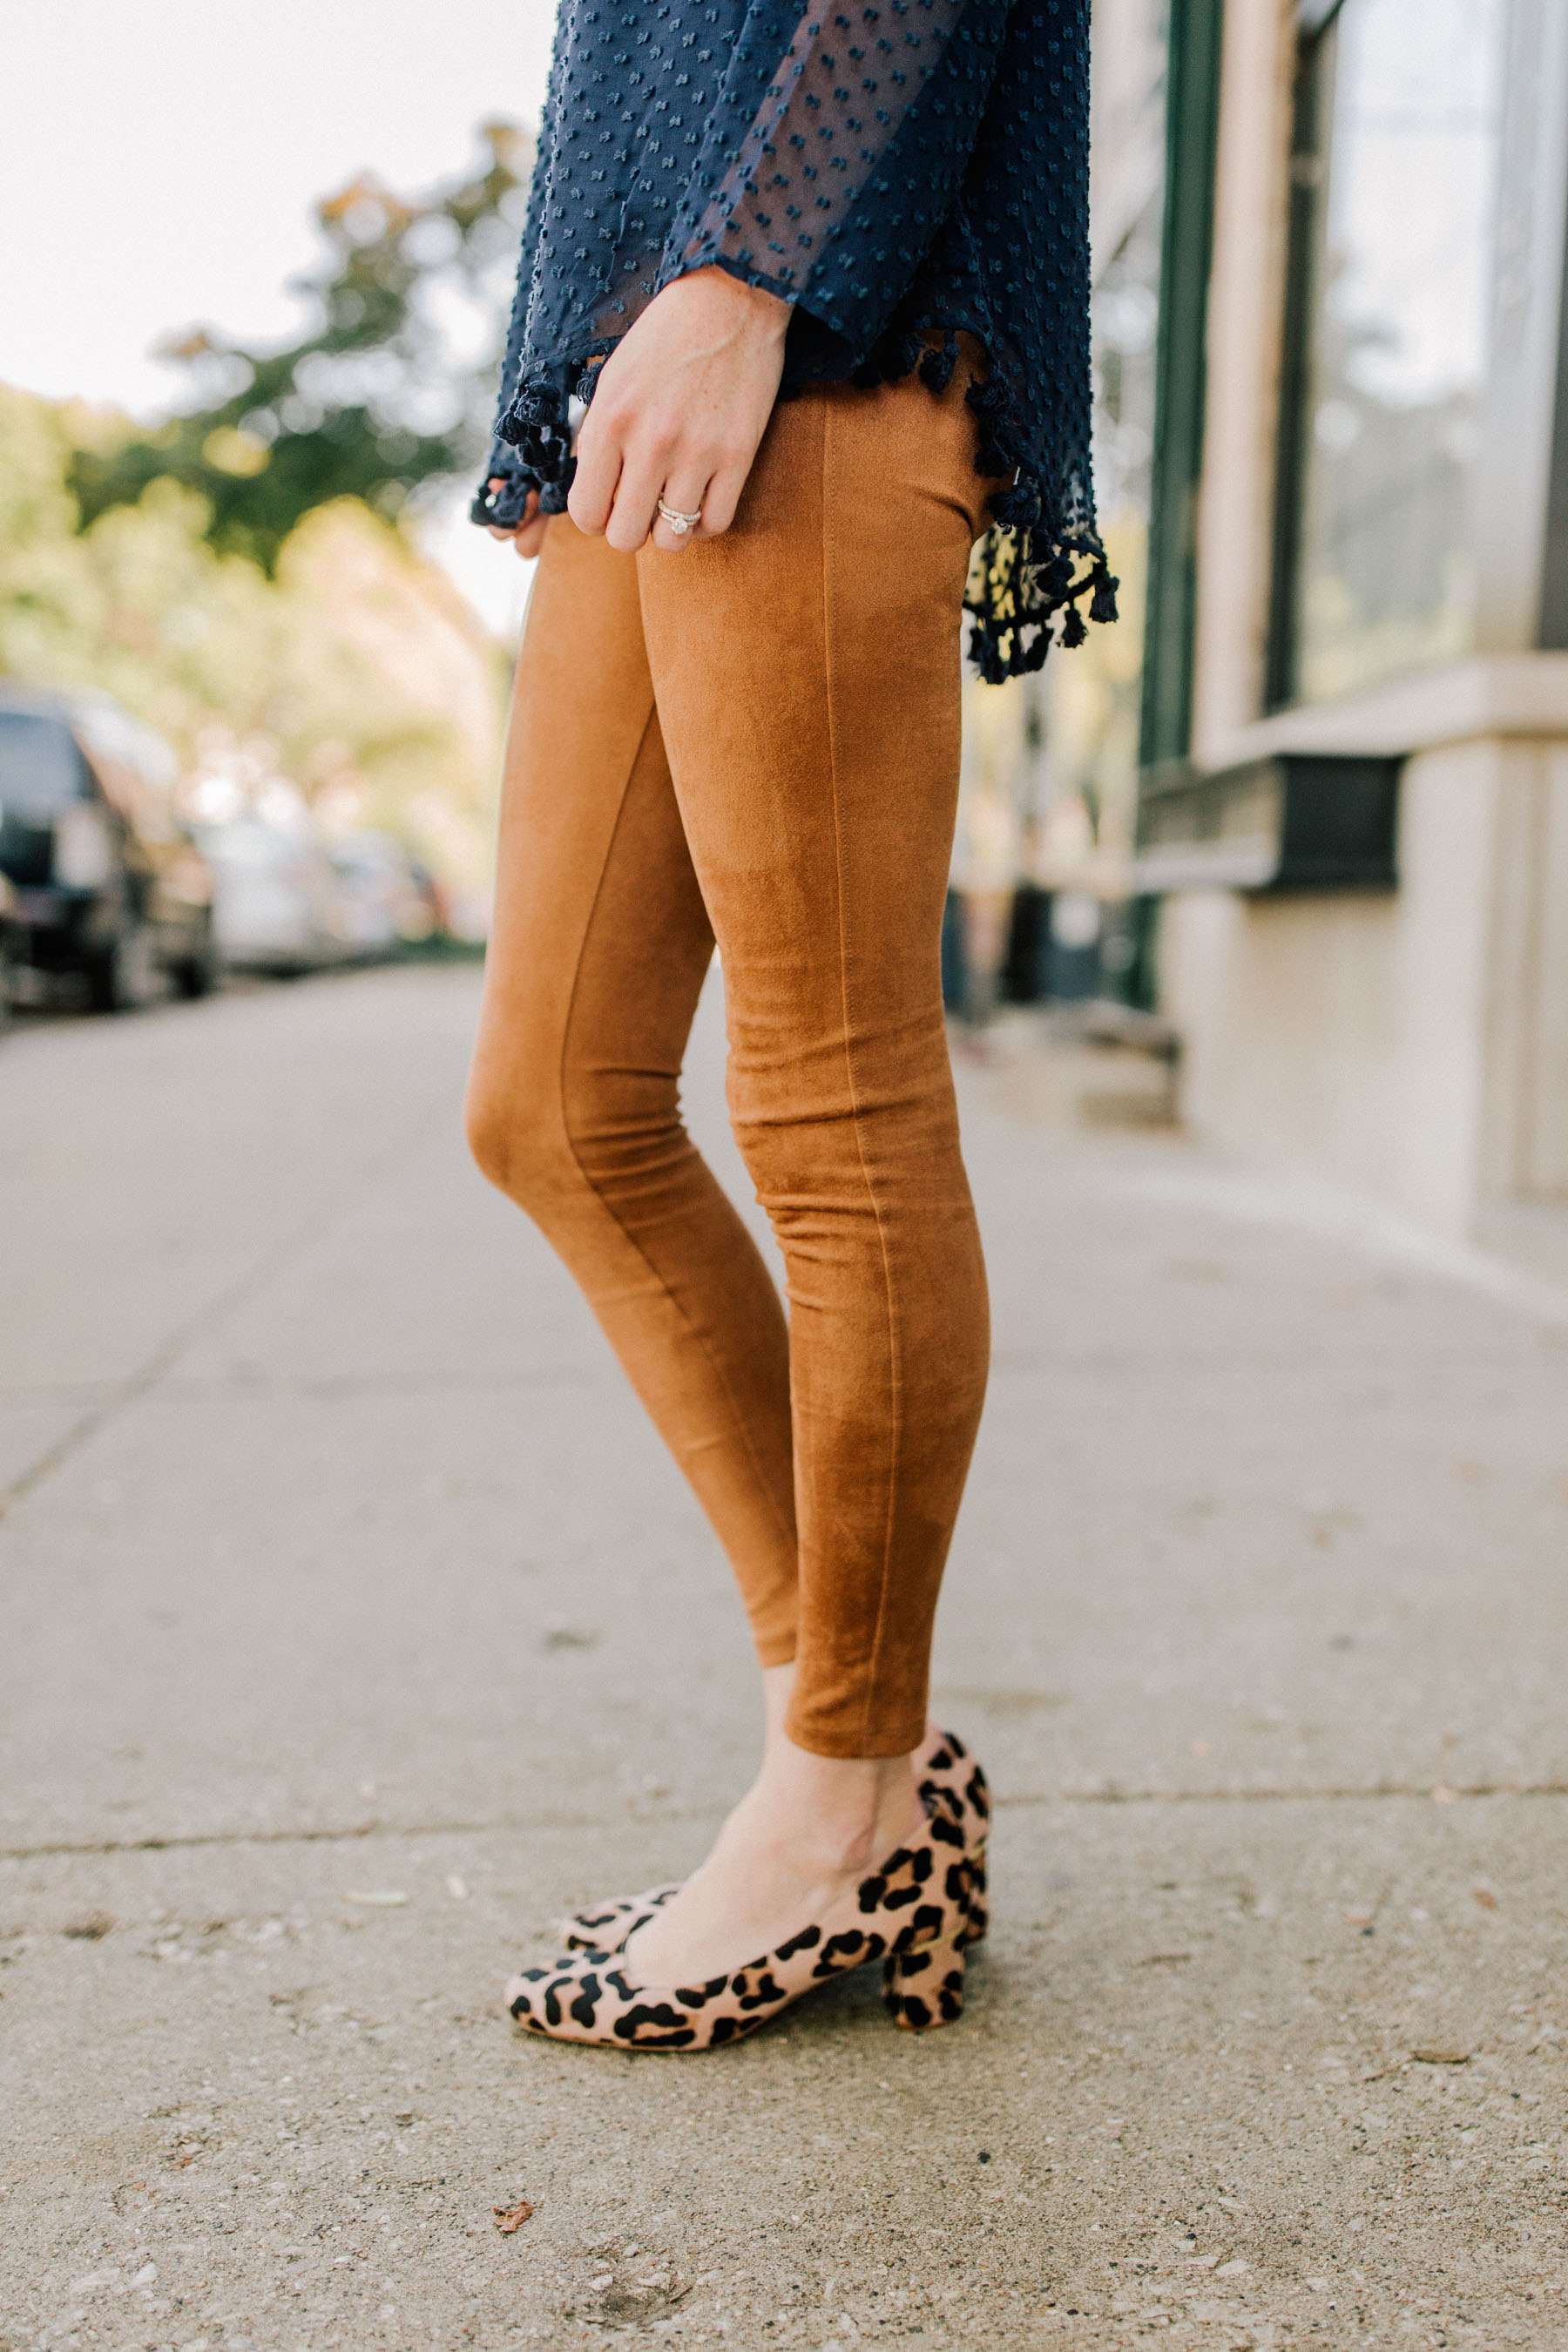 5f4930ec107b7 David Lerner Suede Leggings (Love the leather pair, too.) / Kate Spade  Block Heel Leopard Pumps (Also love the mules. More affordable block heel  option: ...